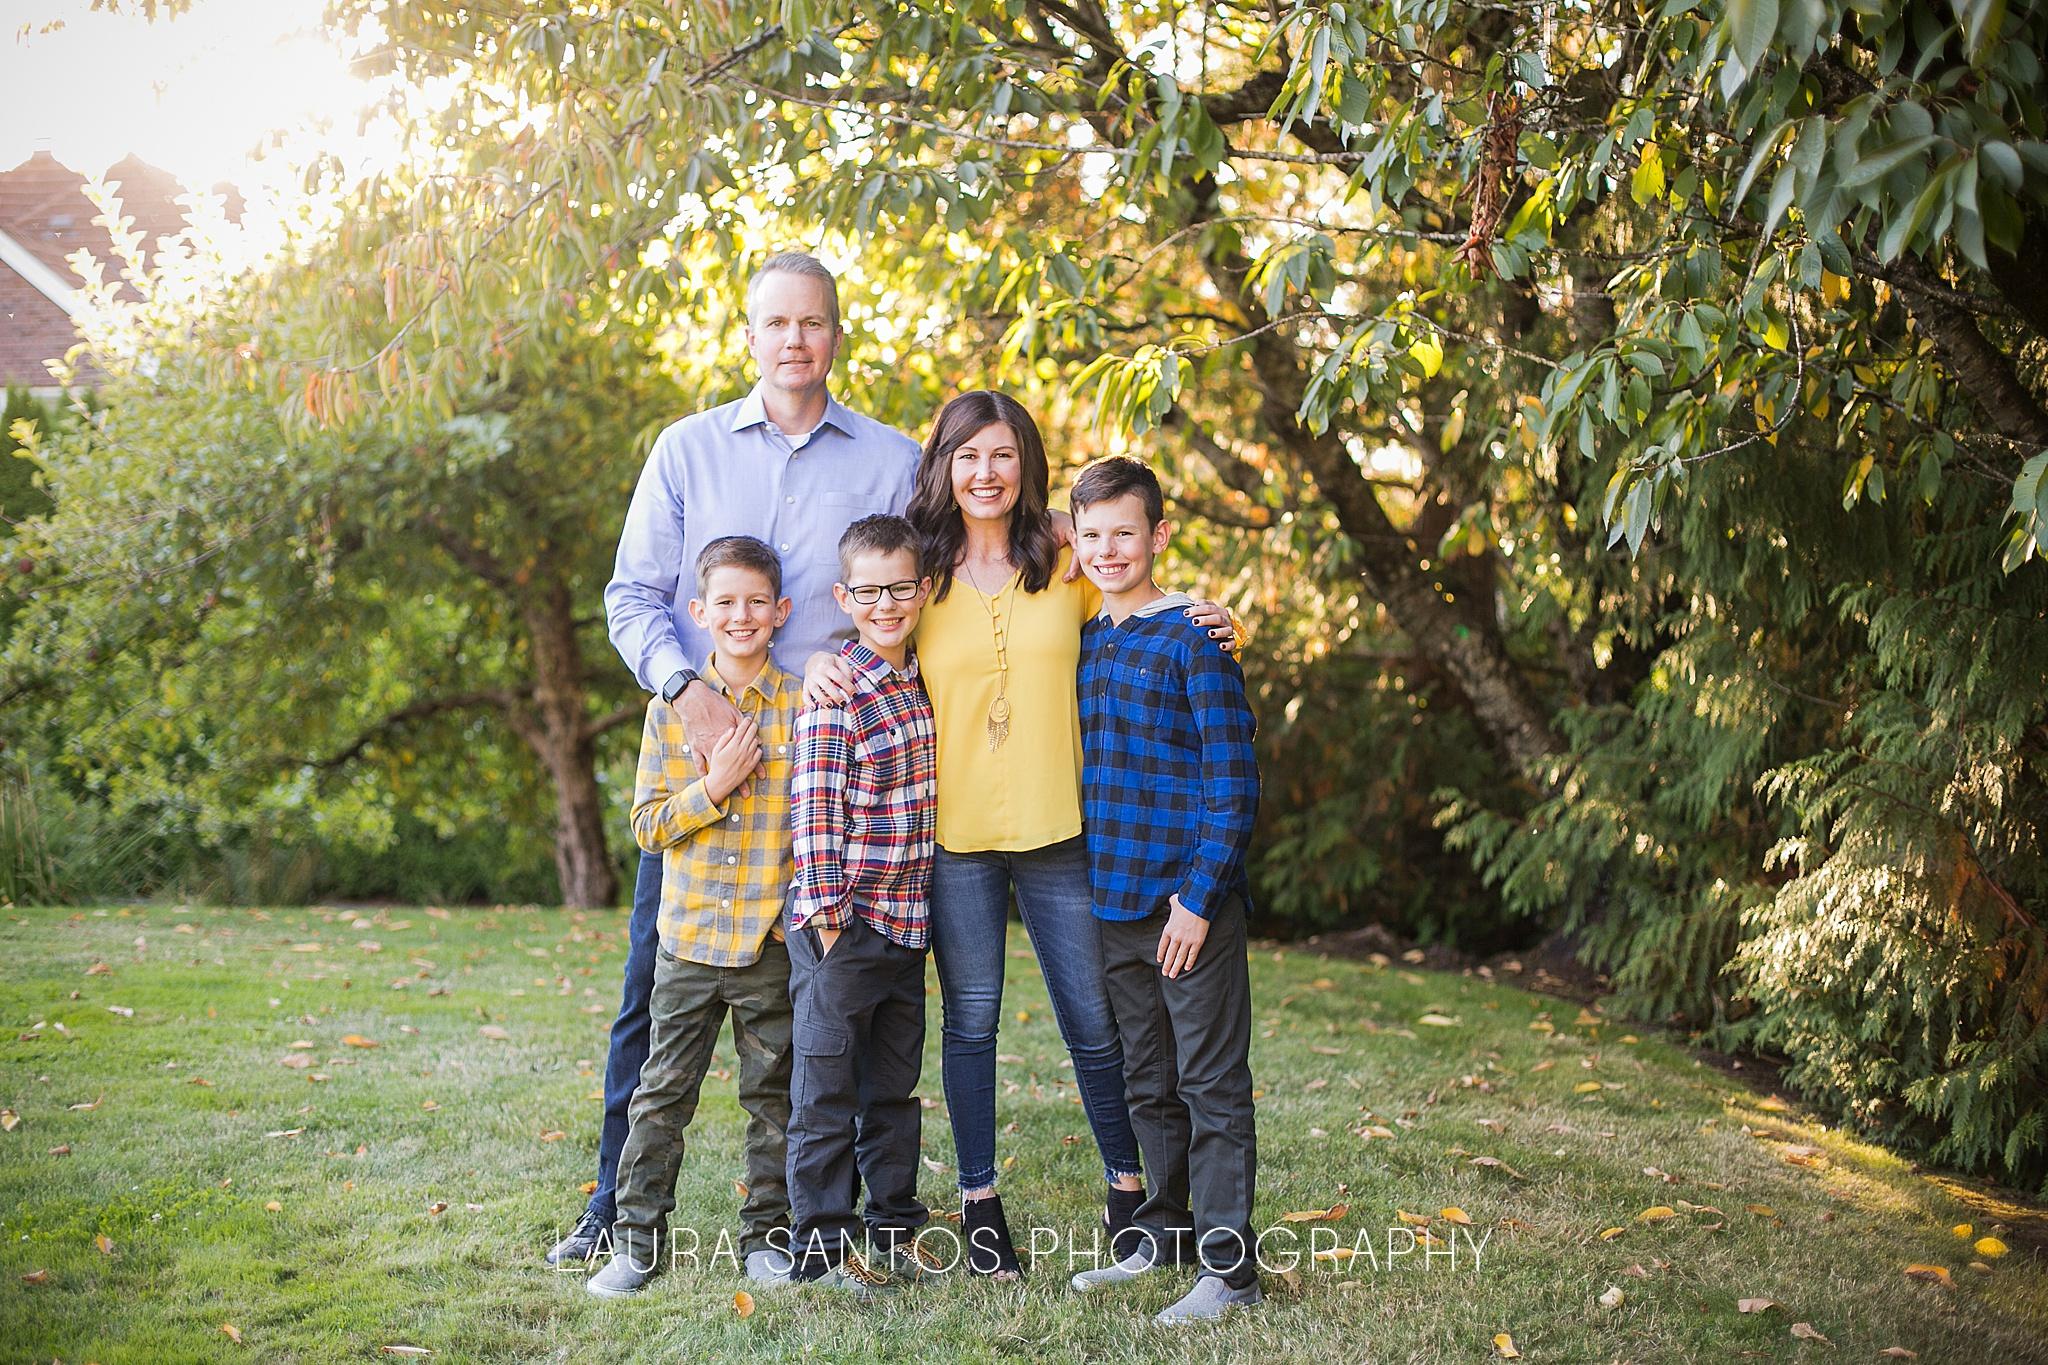 Laura Santos Photography Portland Oregon Family Photographer_0719.jpg